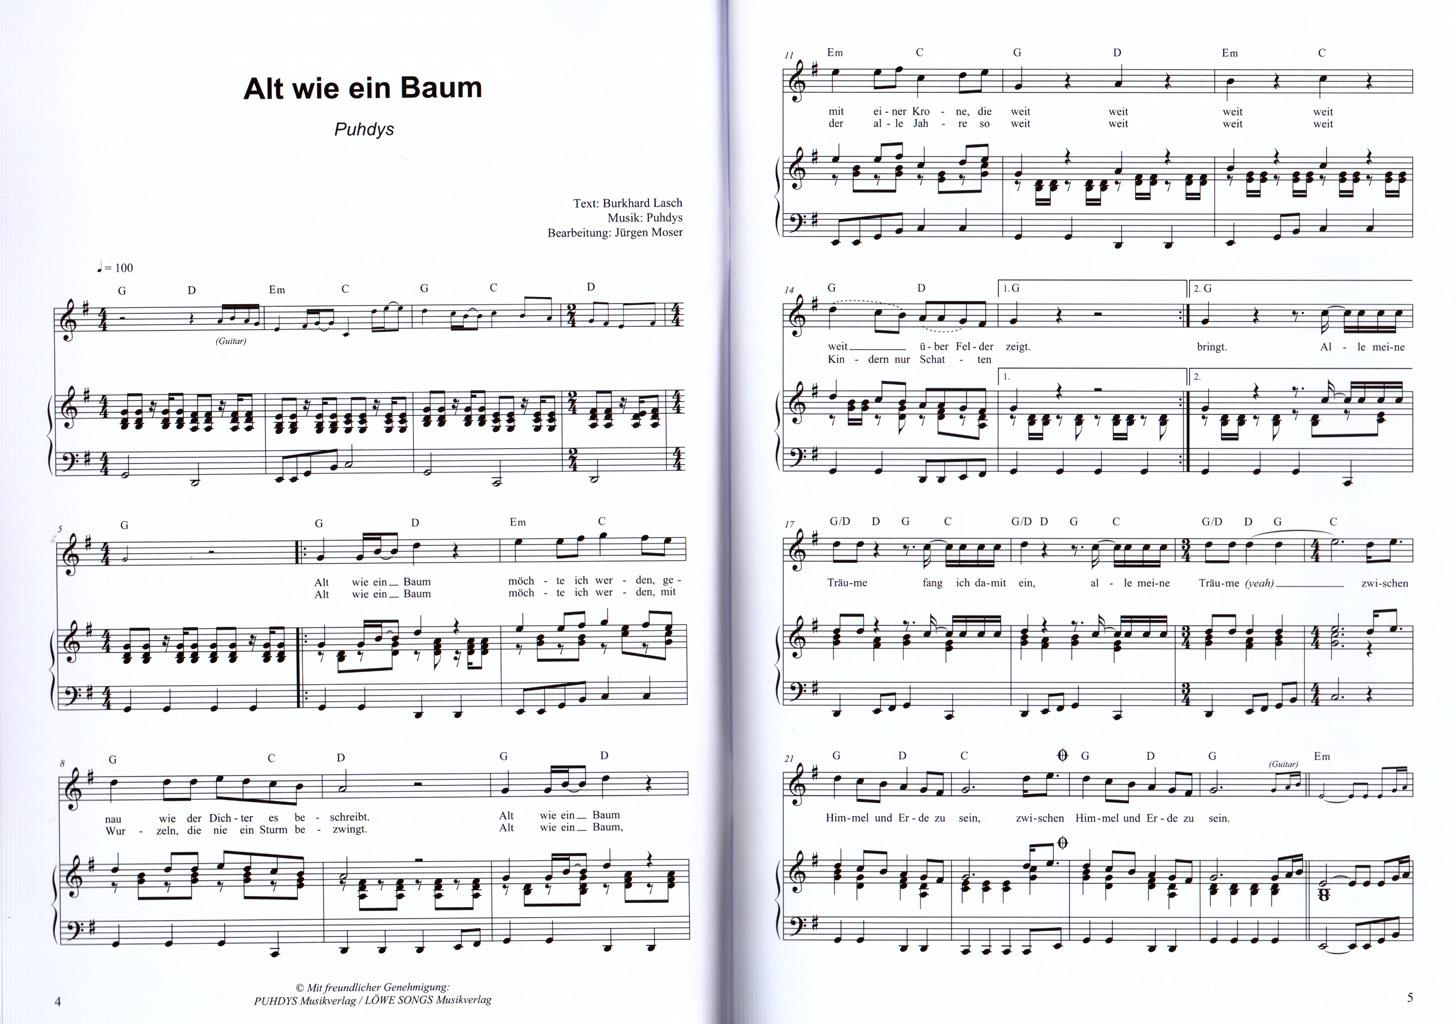 Keimzeit kling klaviernoten klang Kling Klang